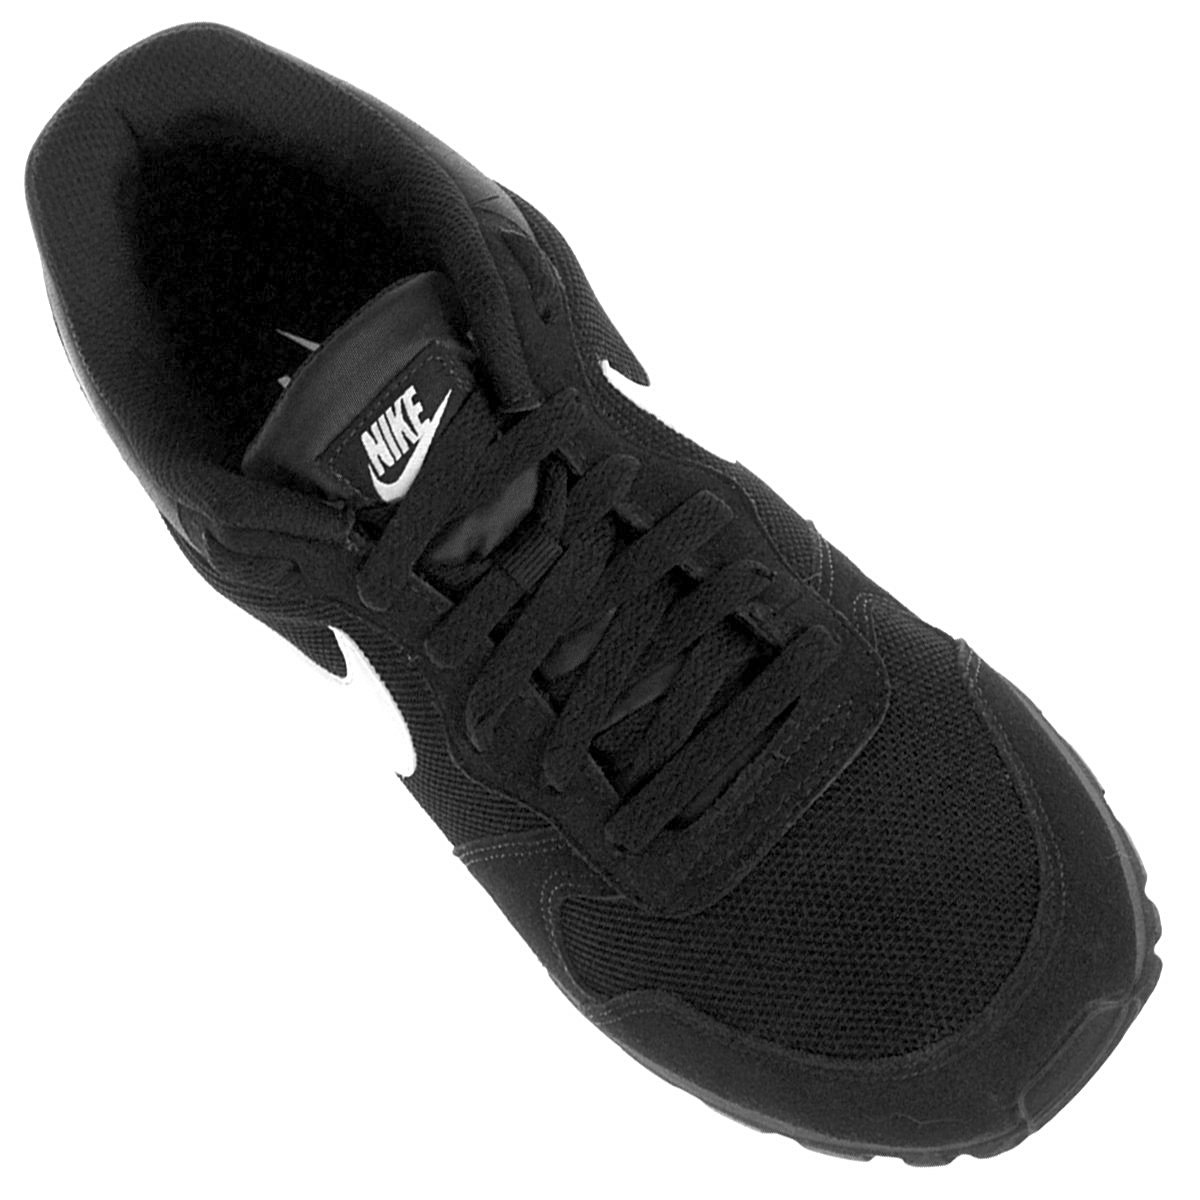 Tênis Nike Md Runner 2 Masculino - Preto e Branco - Compre Agora ... 0ff1f4ce73af9